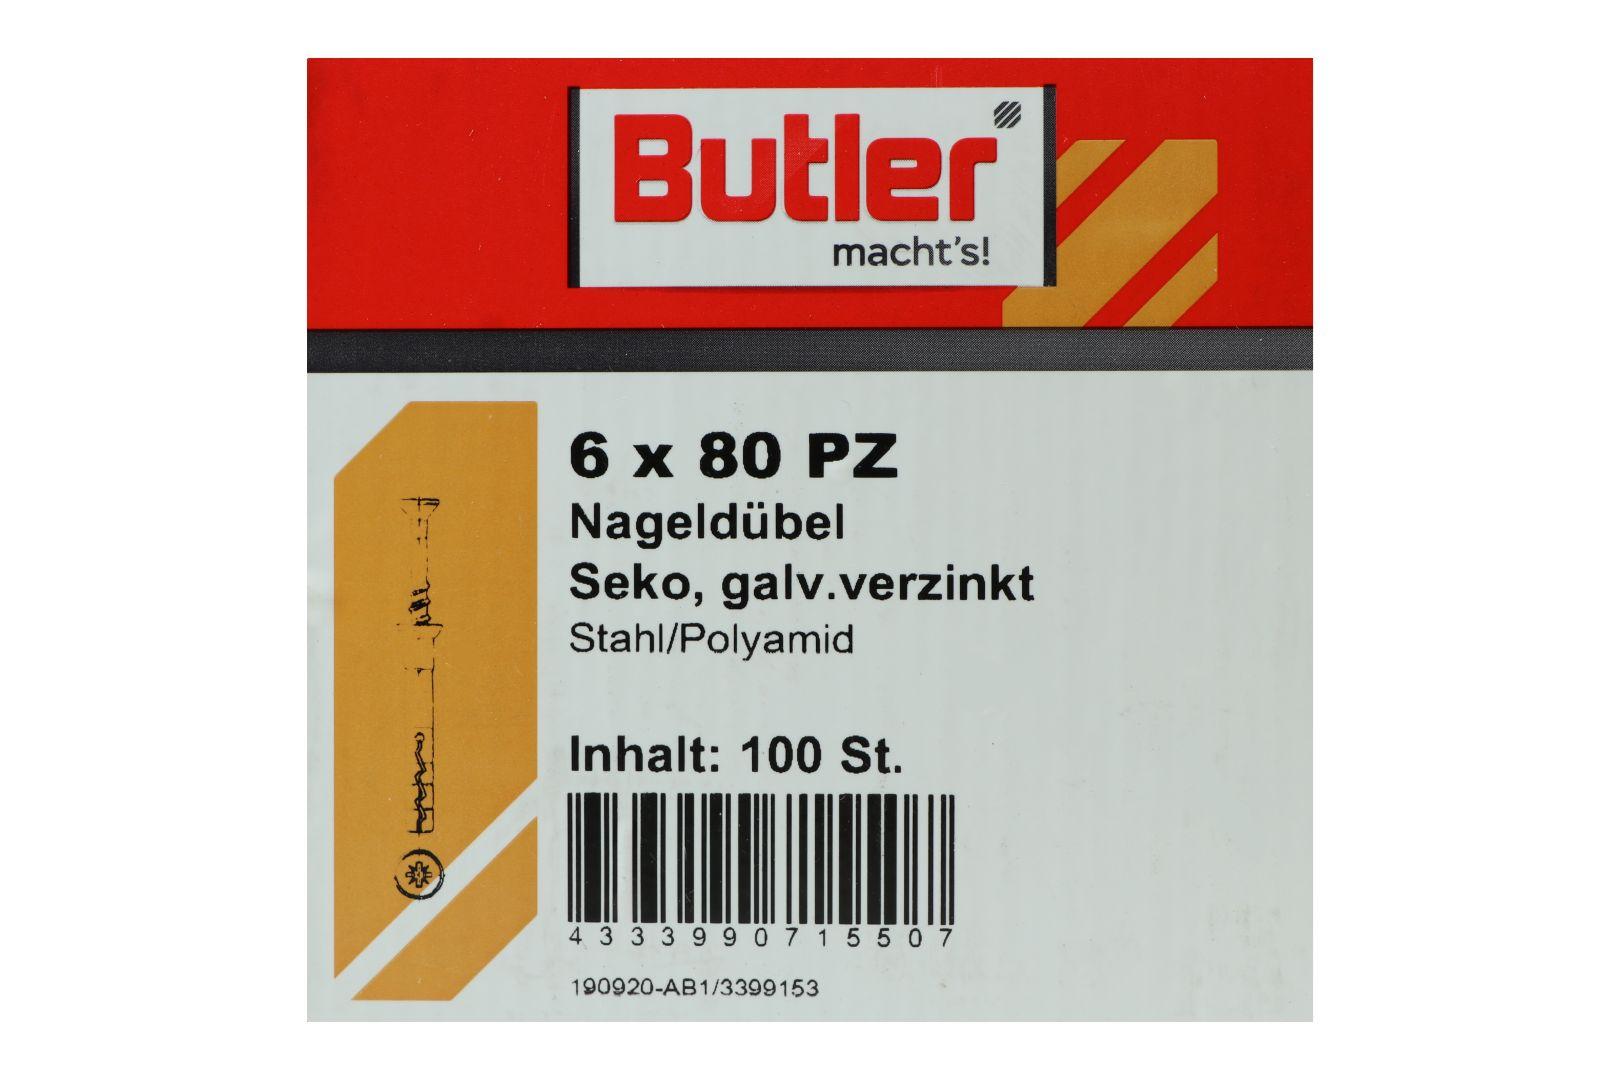 Butler macht's! Nageldübel, Stahl / Polyamid, Senkkopf, galvanisch verzinkt 6 x 80 mm, 100 Stück